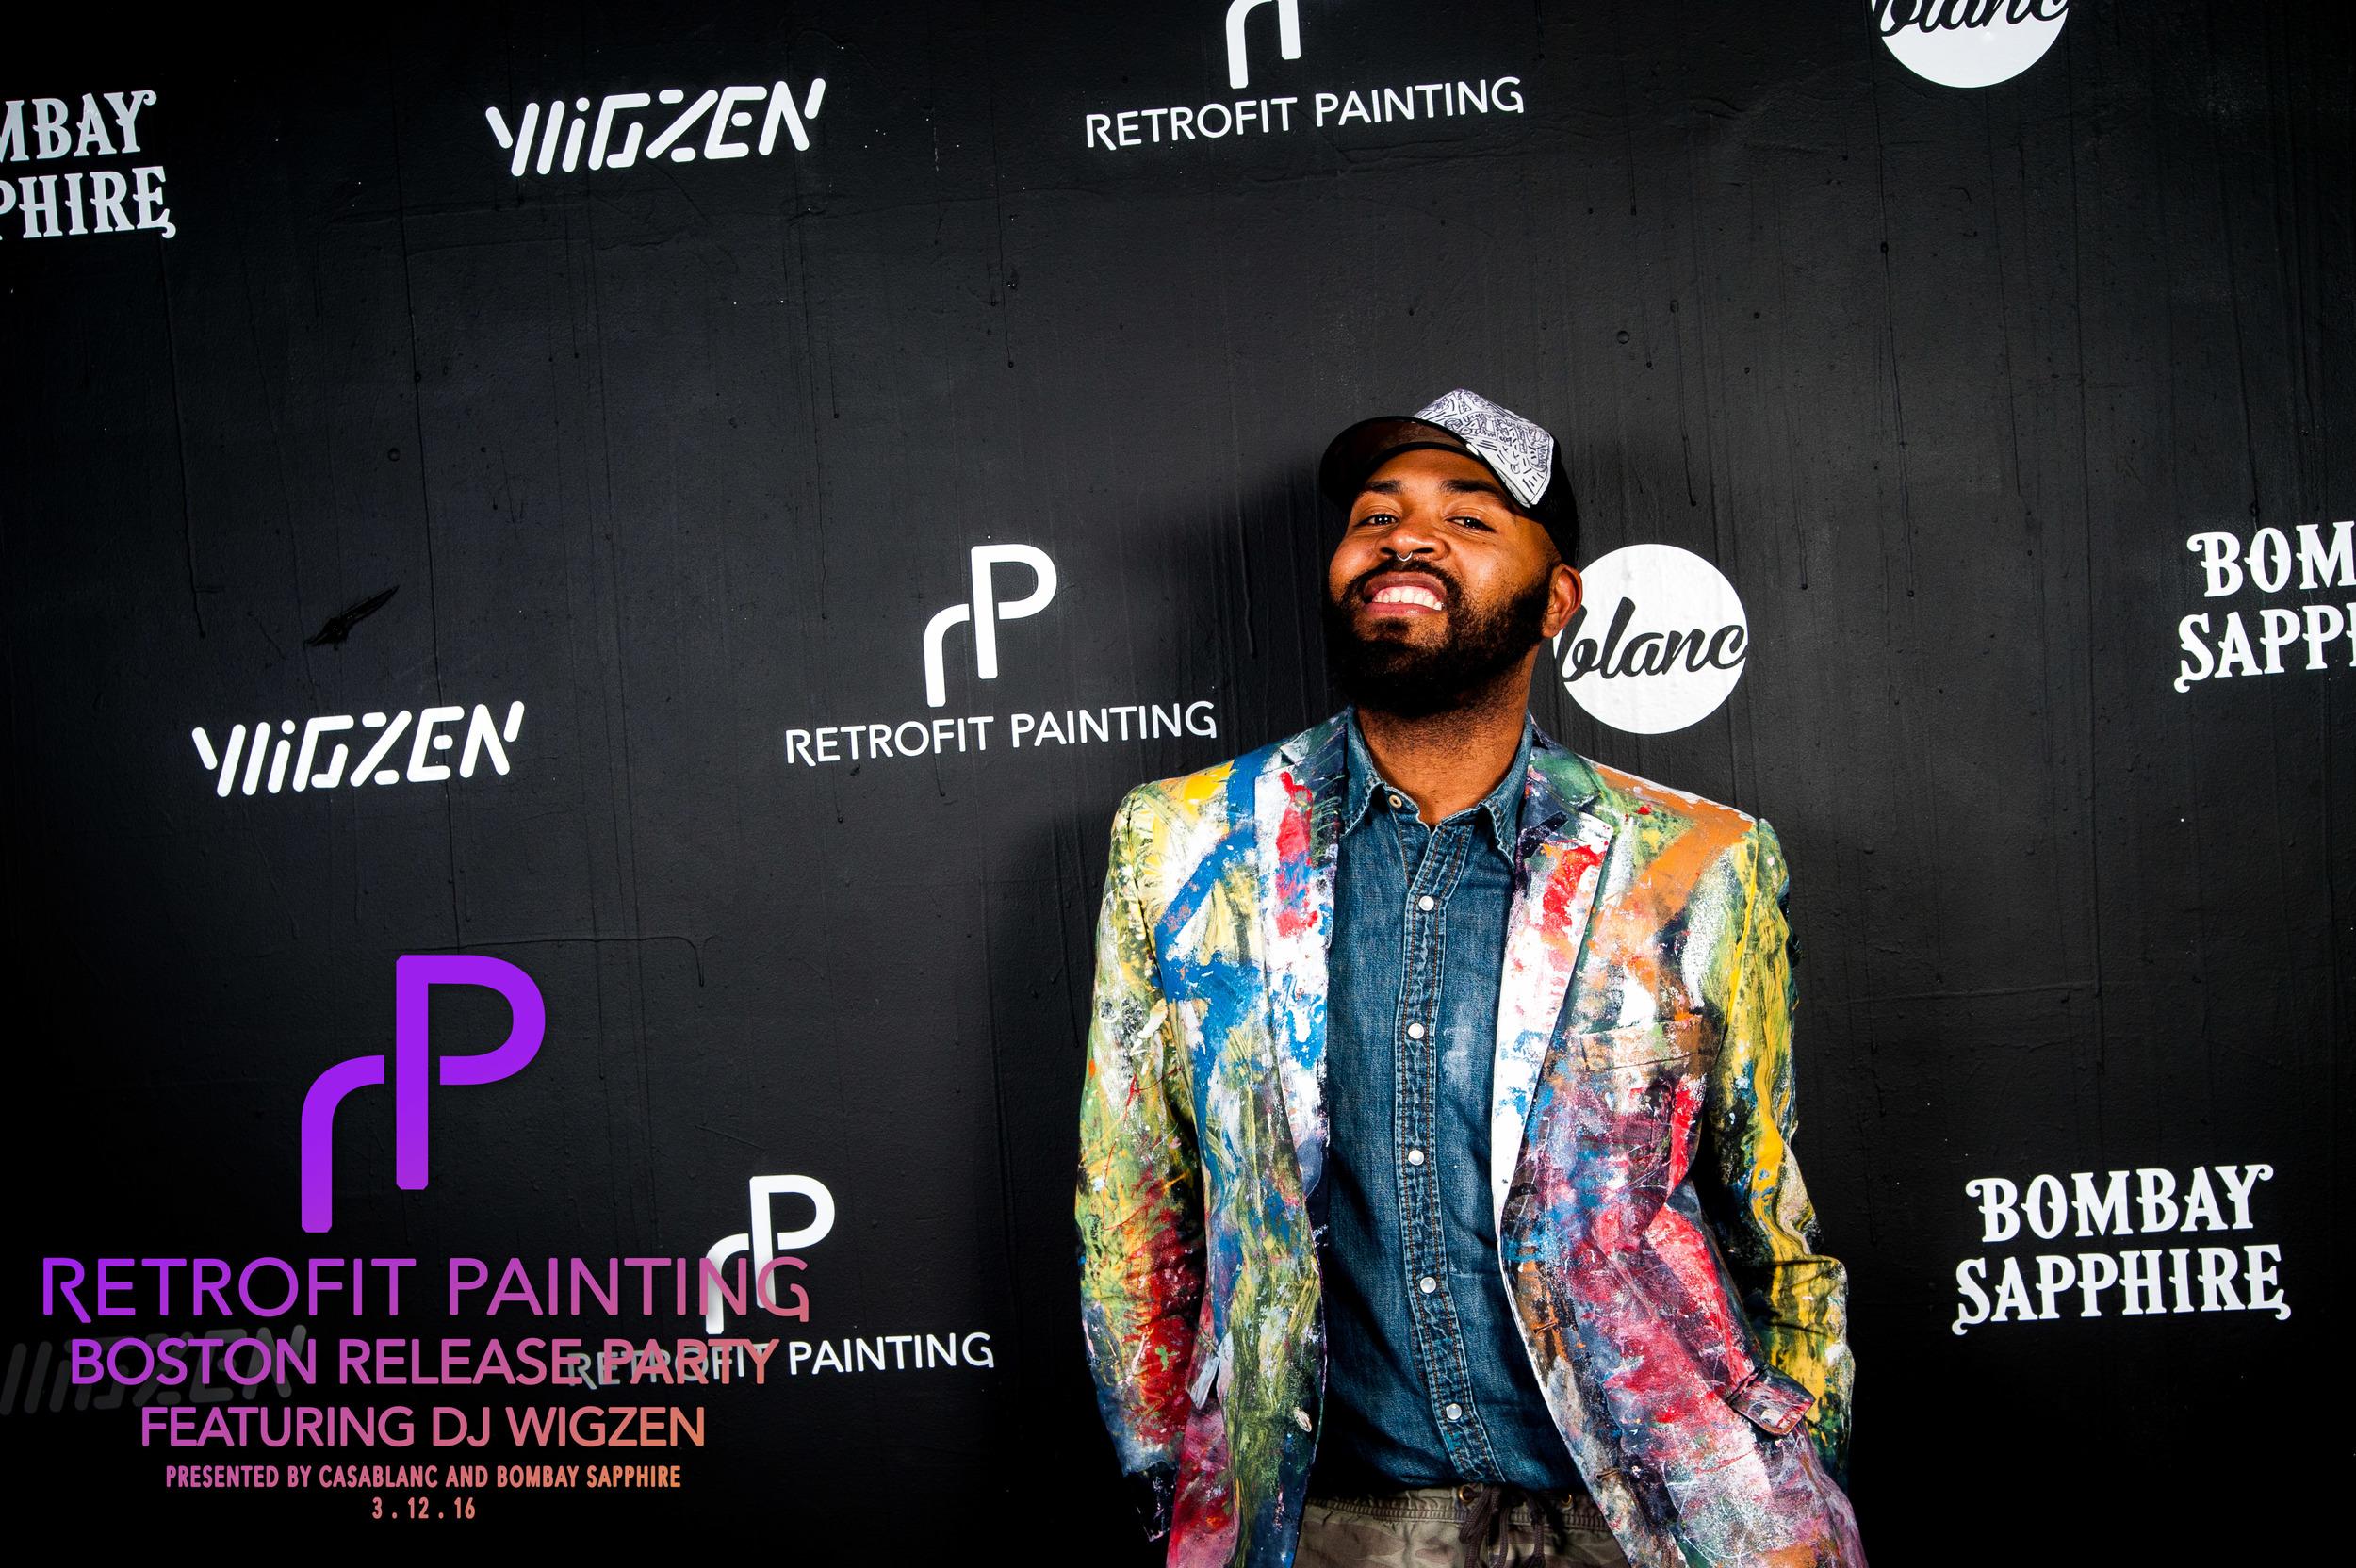 Retrofit Painting Boston Release Party 001-2.jpg